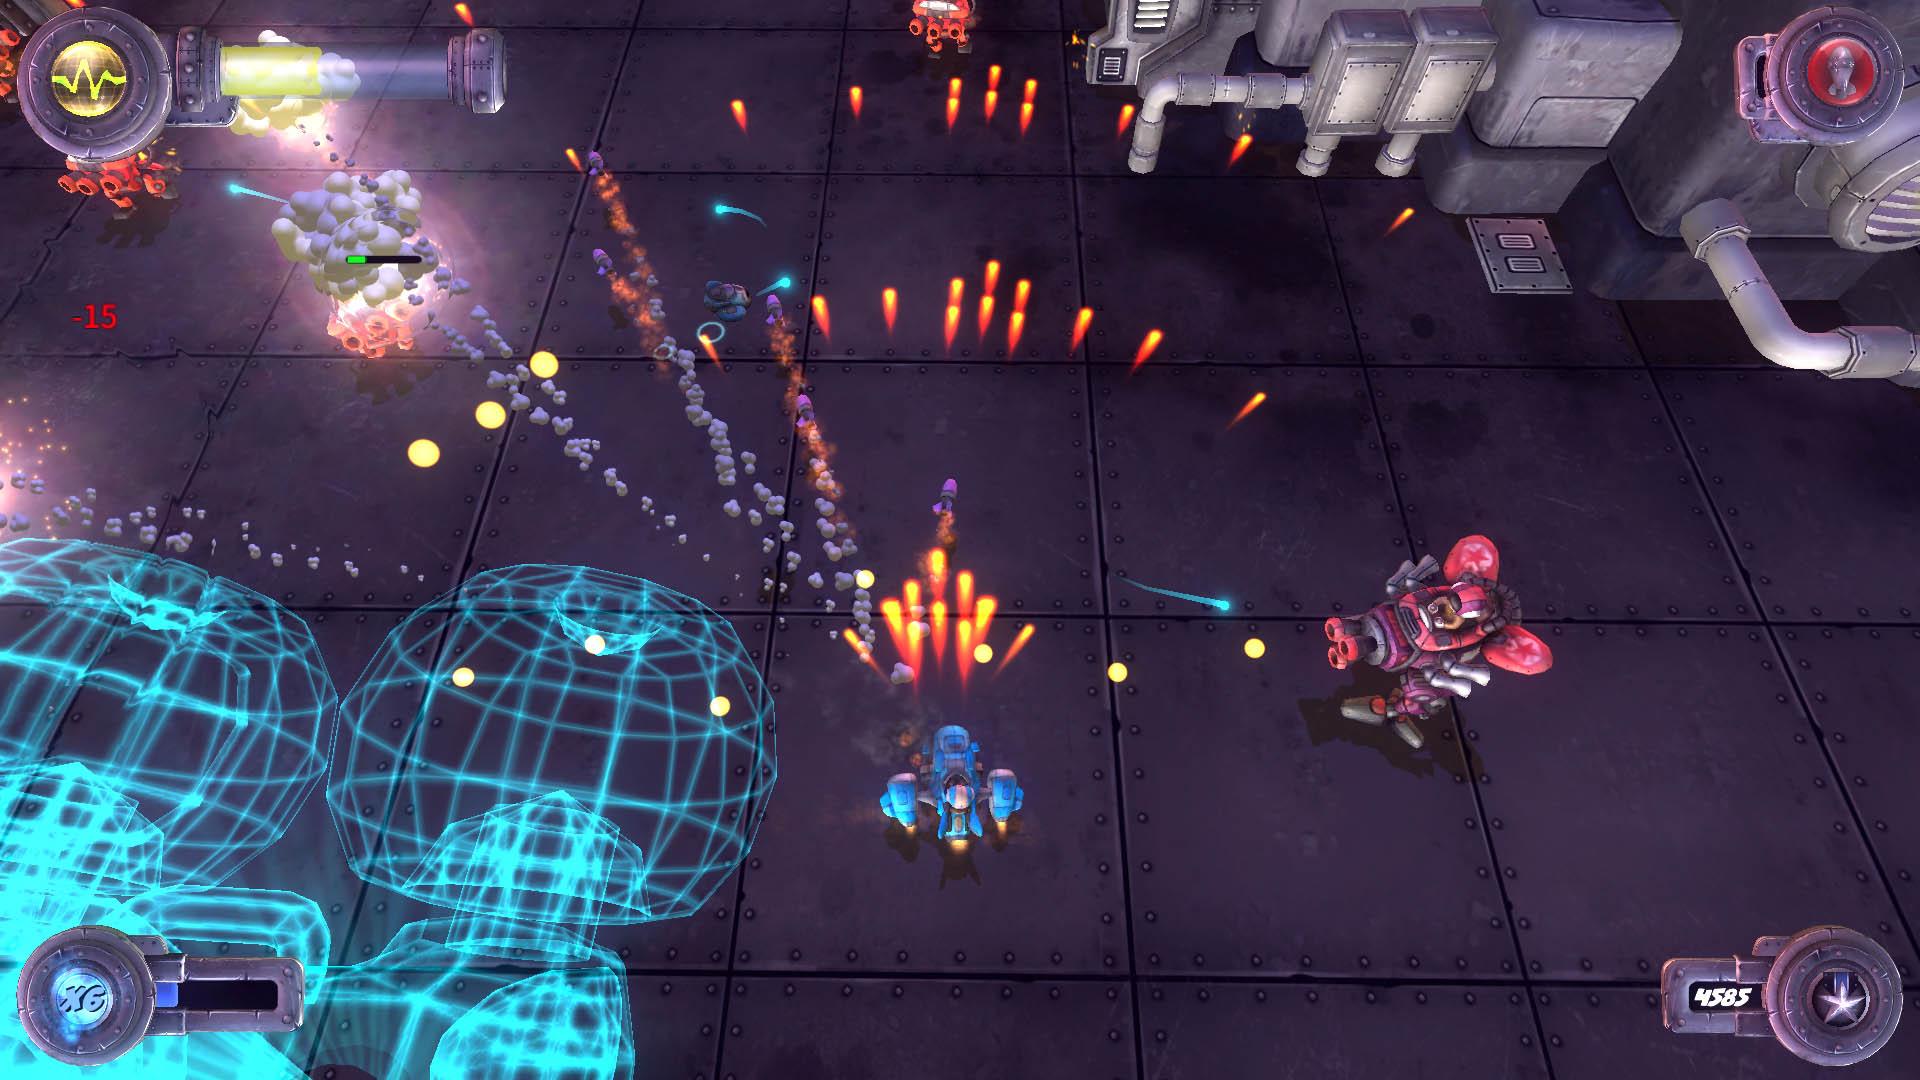 『Blue Rider』ゲーム画面